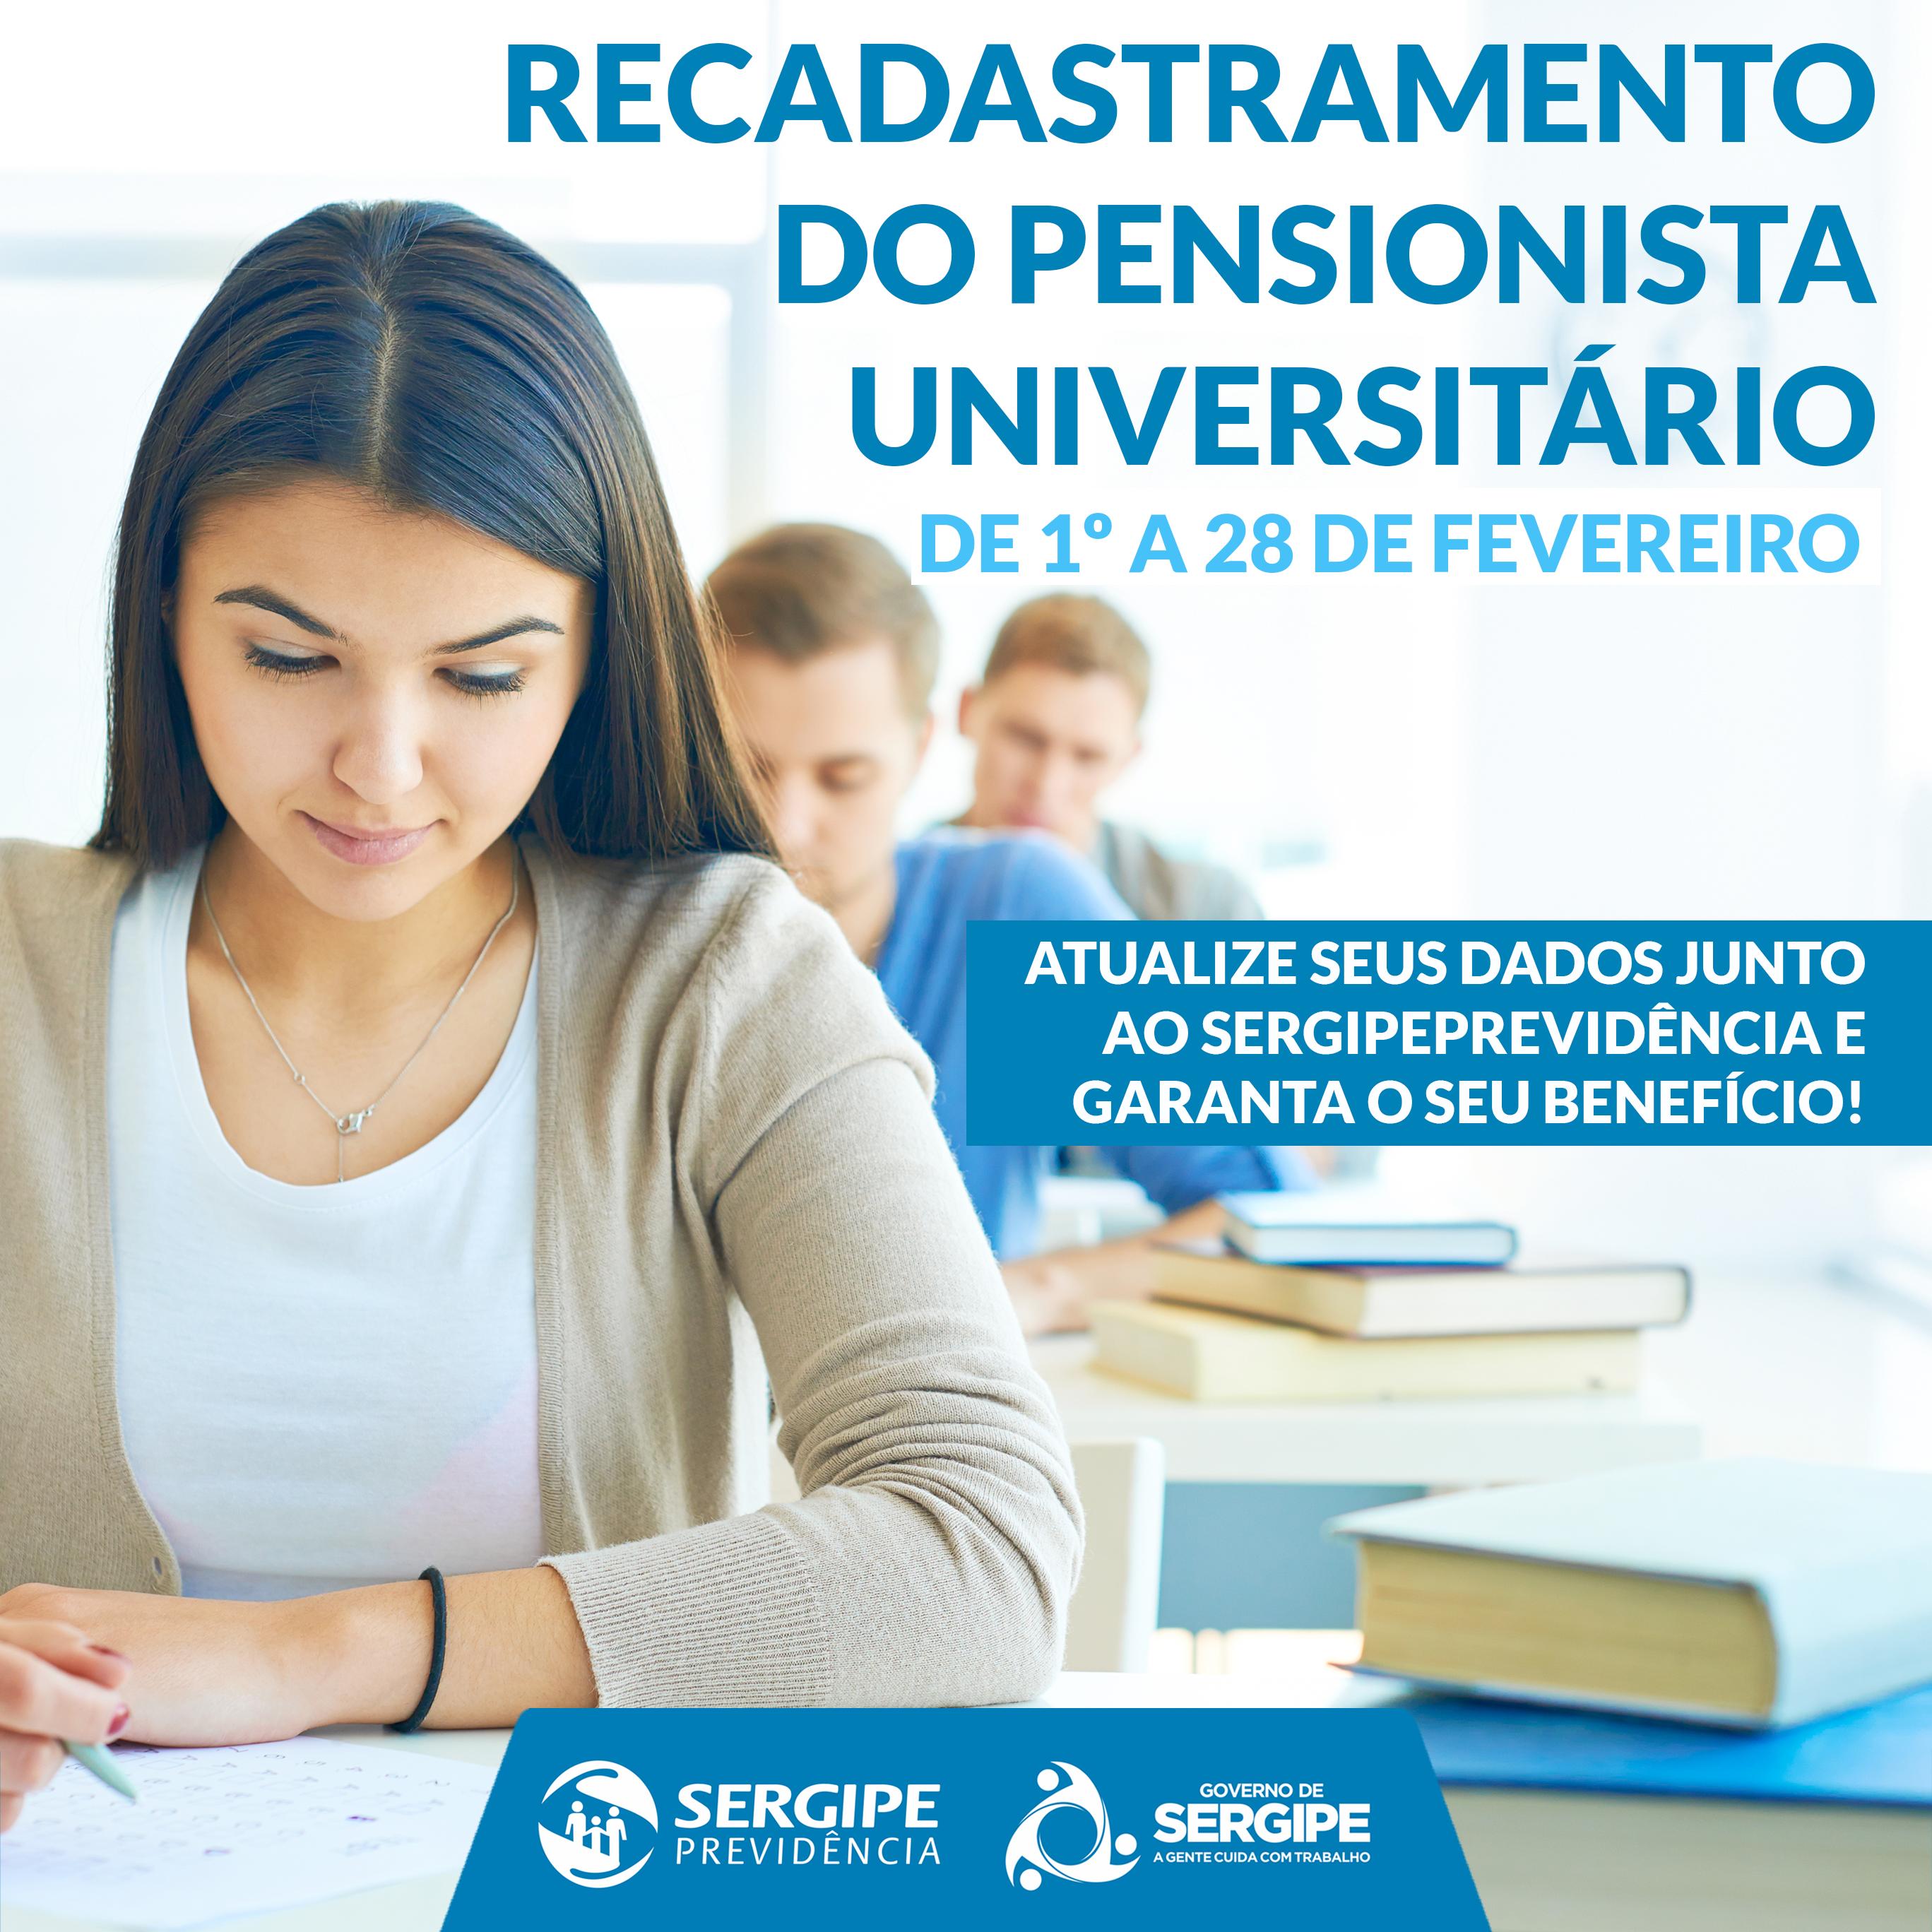 Sergipeprevid ncia convoca pensionistas universit rios for Pension para universitarios